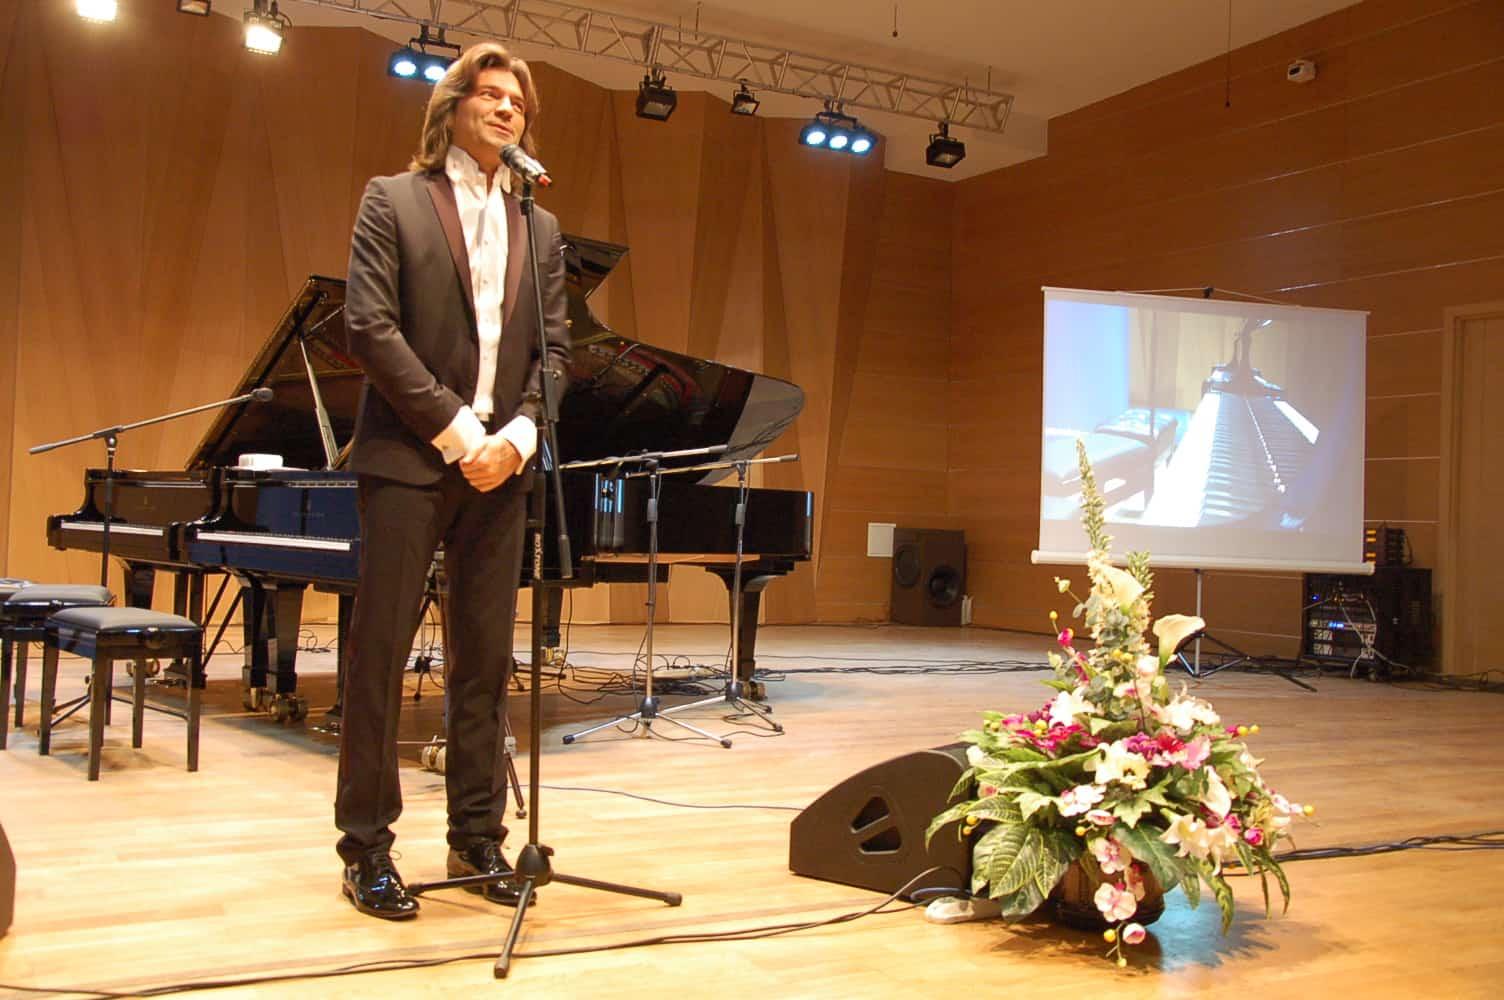 Дмитрий Маликов дал уроки музыки